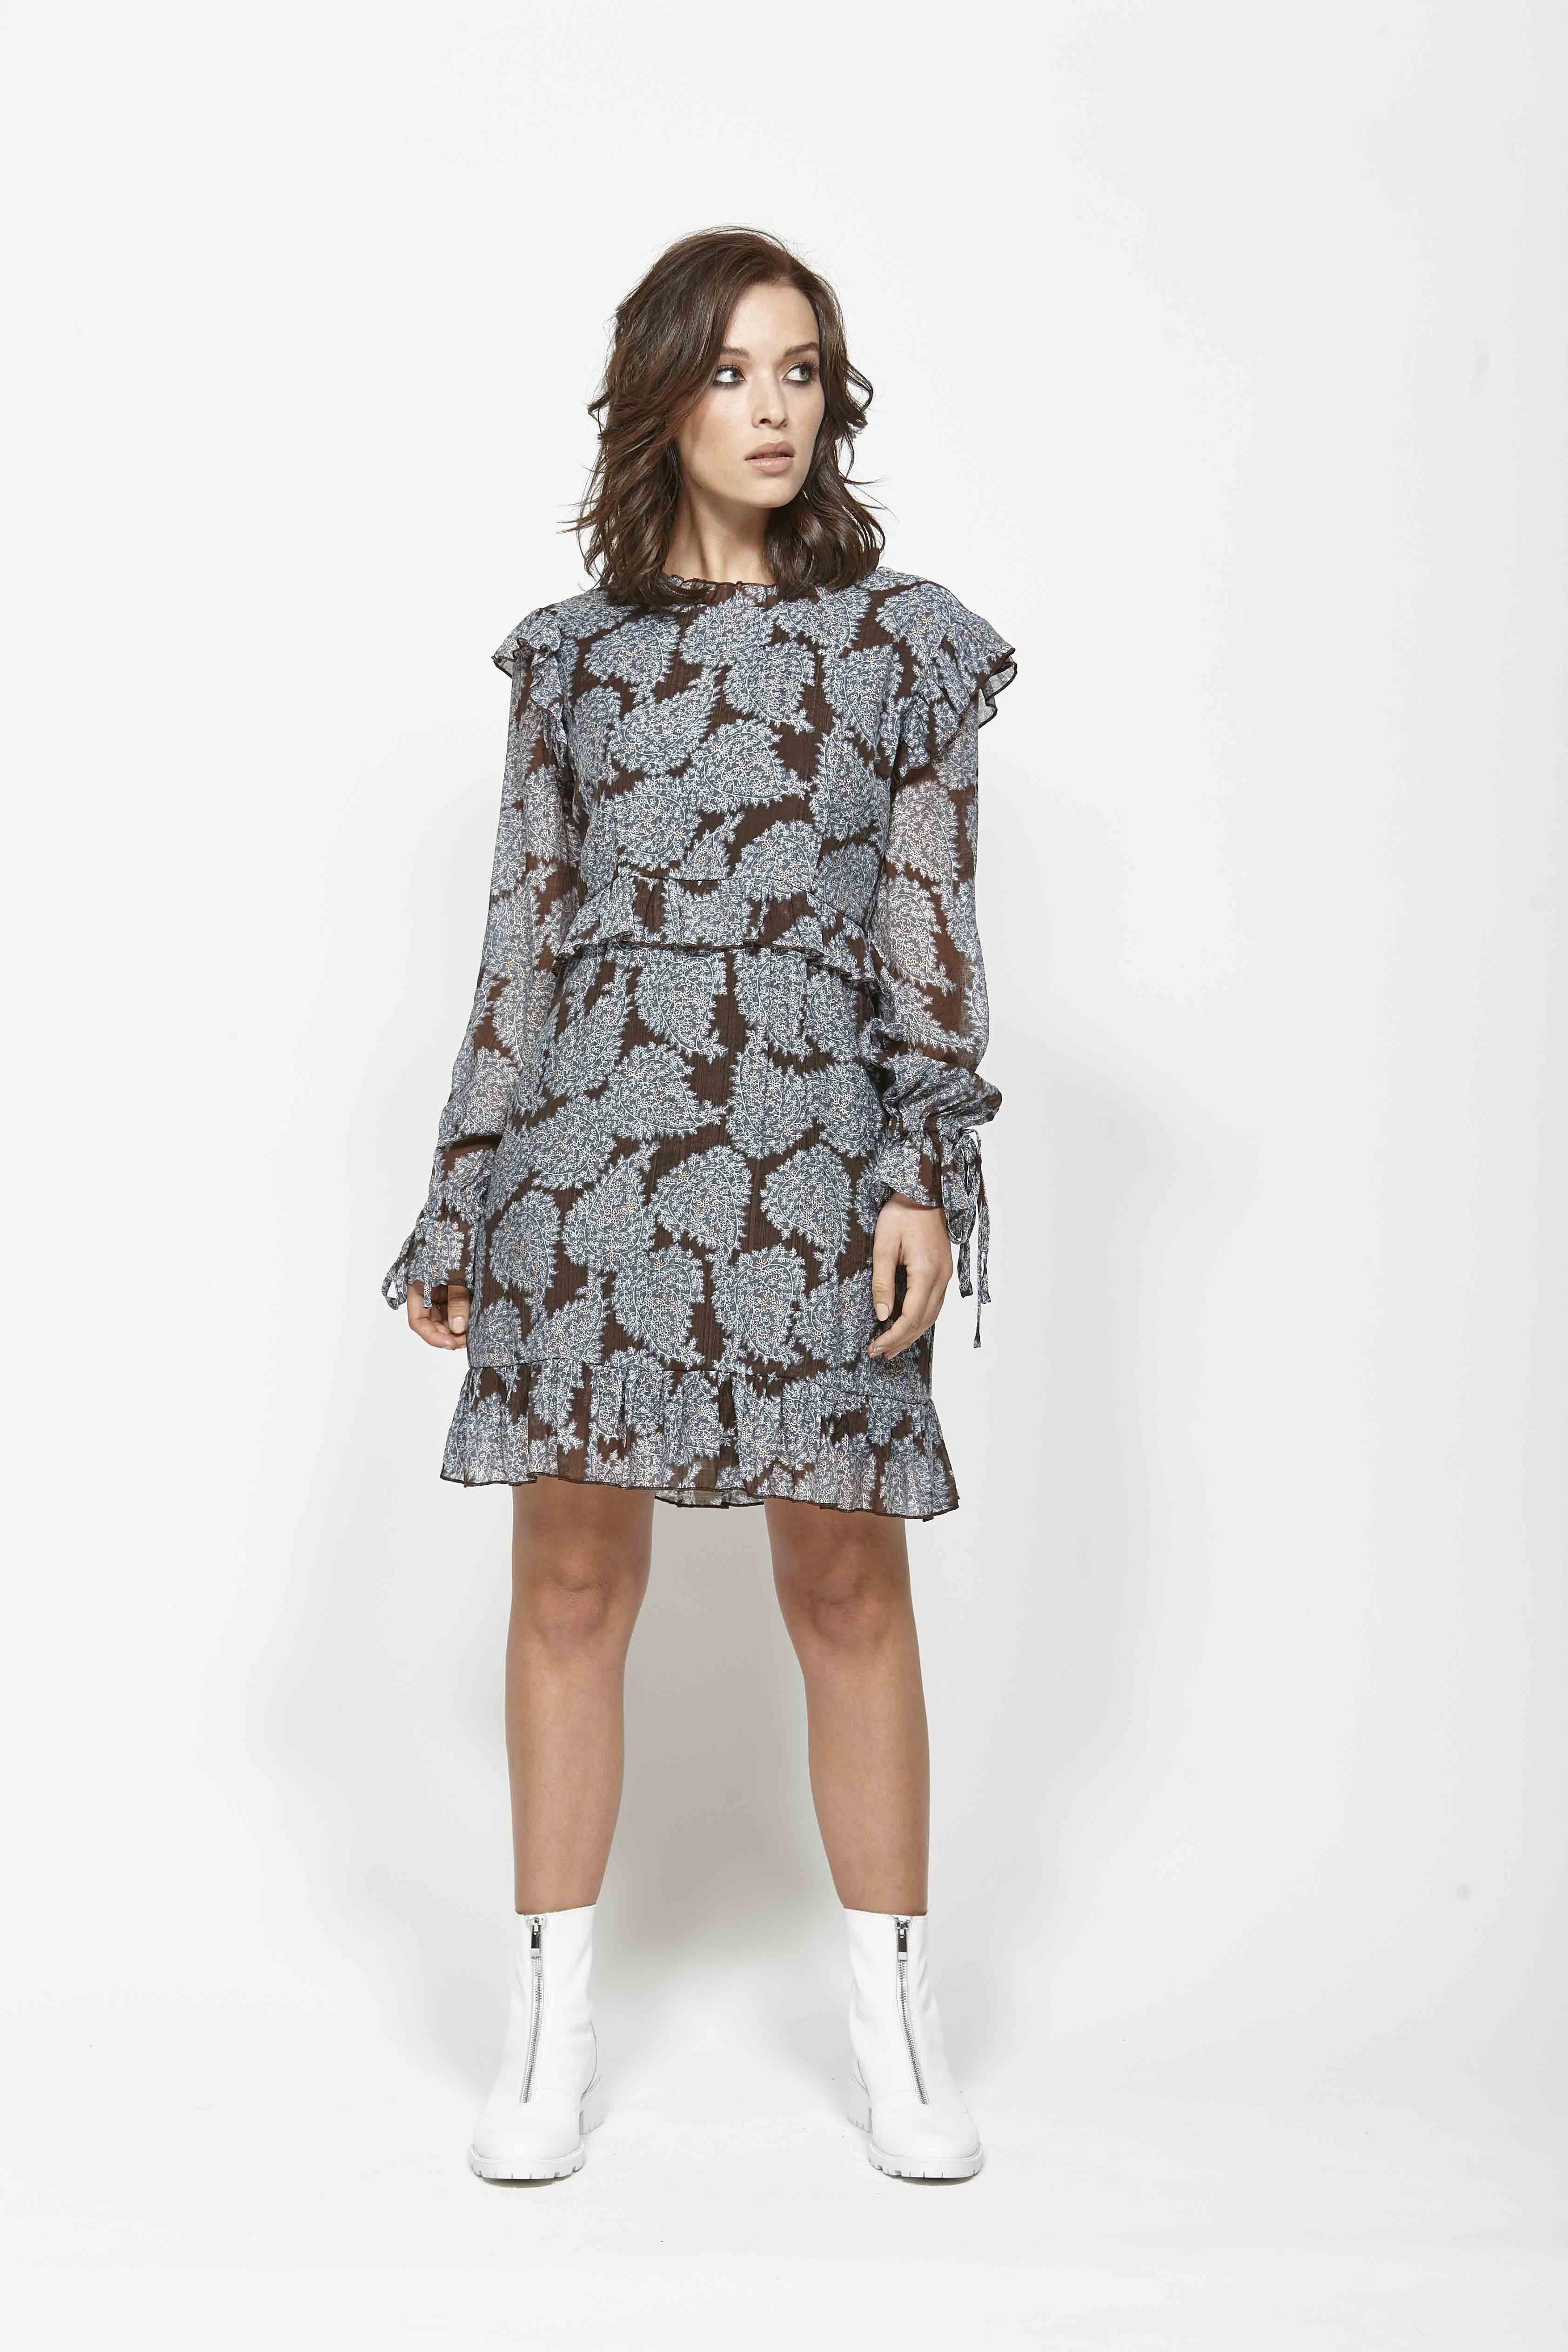 LEO+BE LB1355 Bench Dress, RRP$159.00